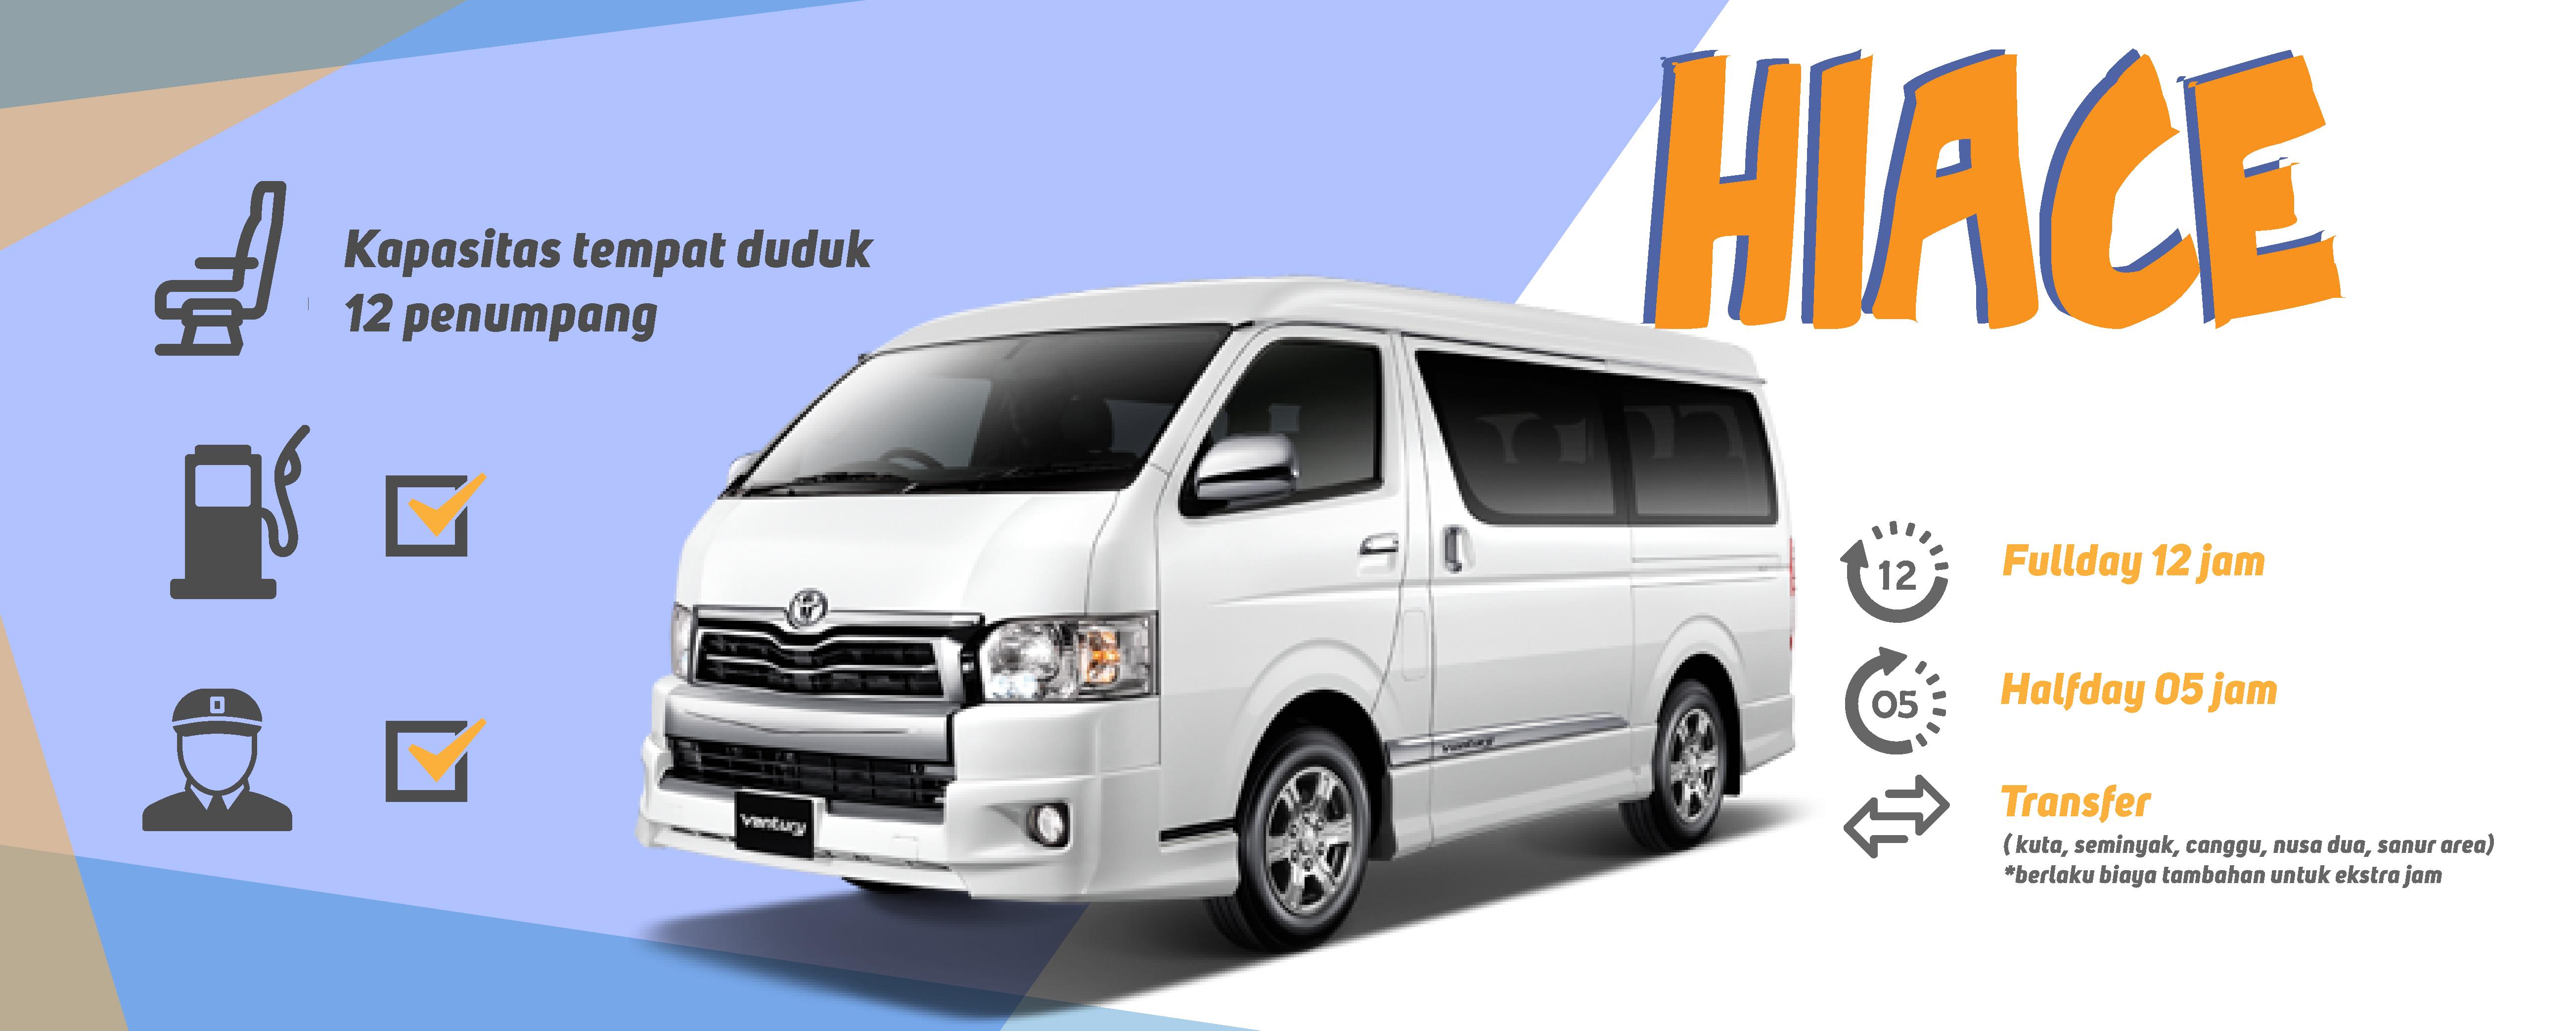 Hiace-minibus rental bali- Yoexplore.co.id